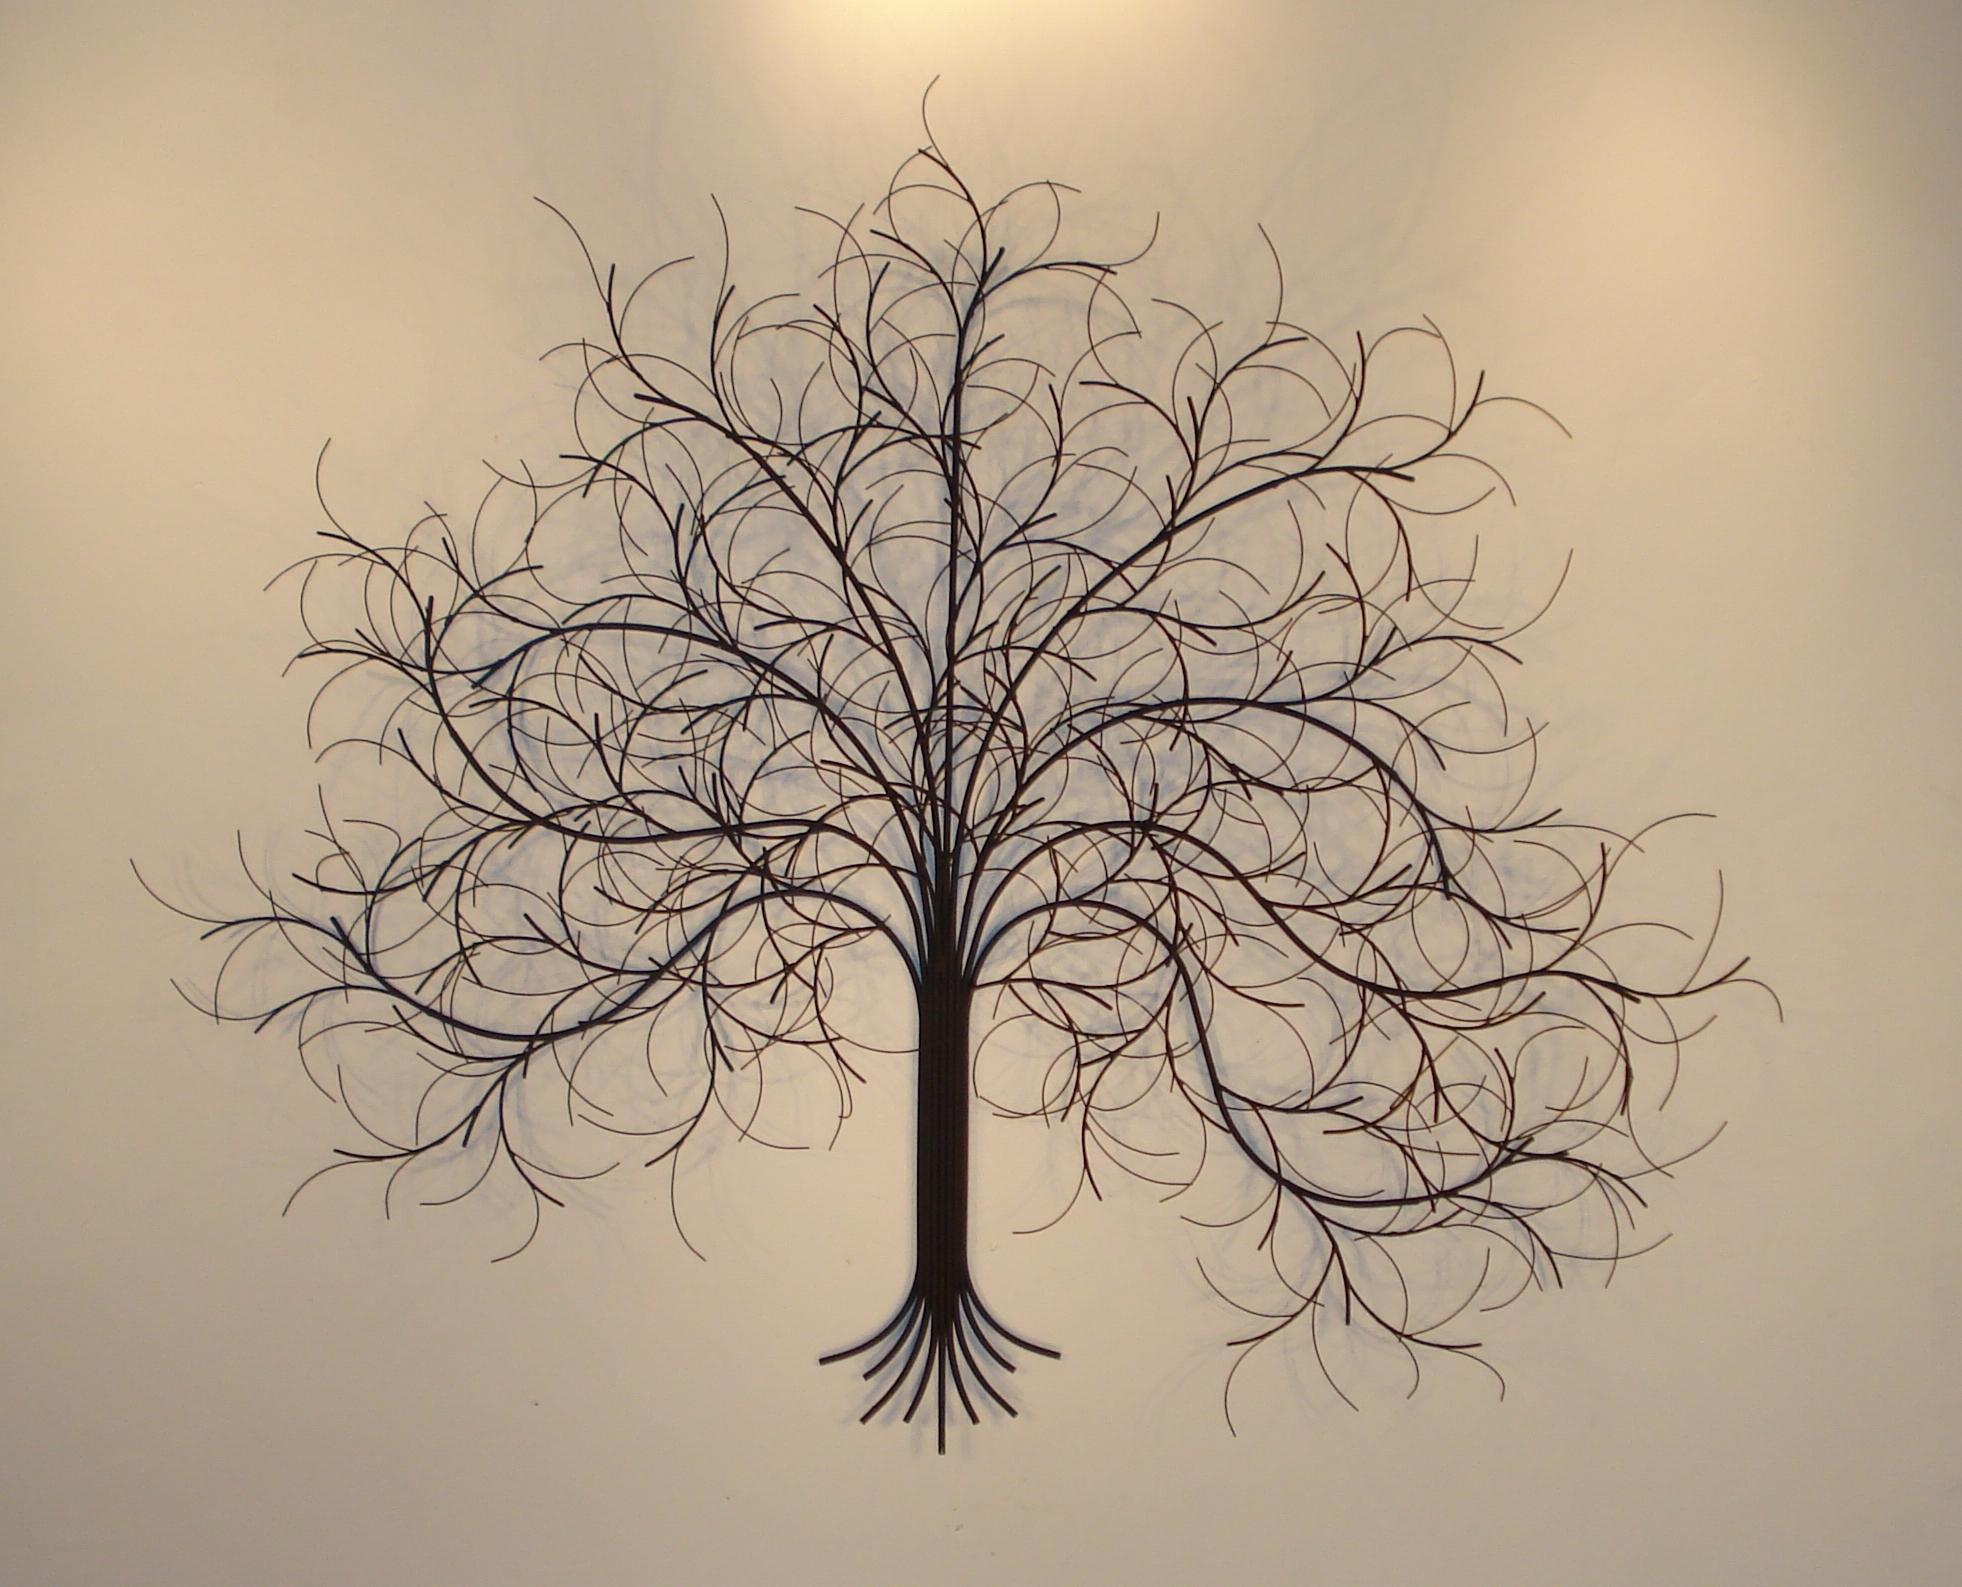 March Tree Metal Wall Art – Metal Sculpture And Wall Decor – Gurtan Inside Latest Metal Tree Wall Art (View 4 of 15)